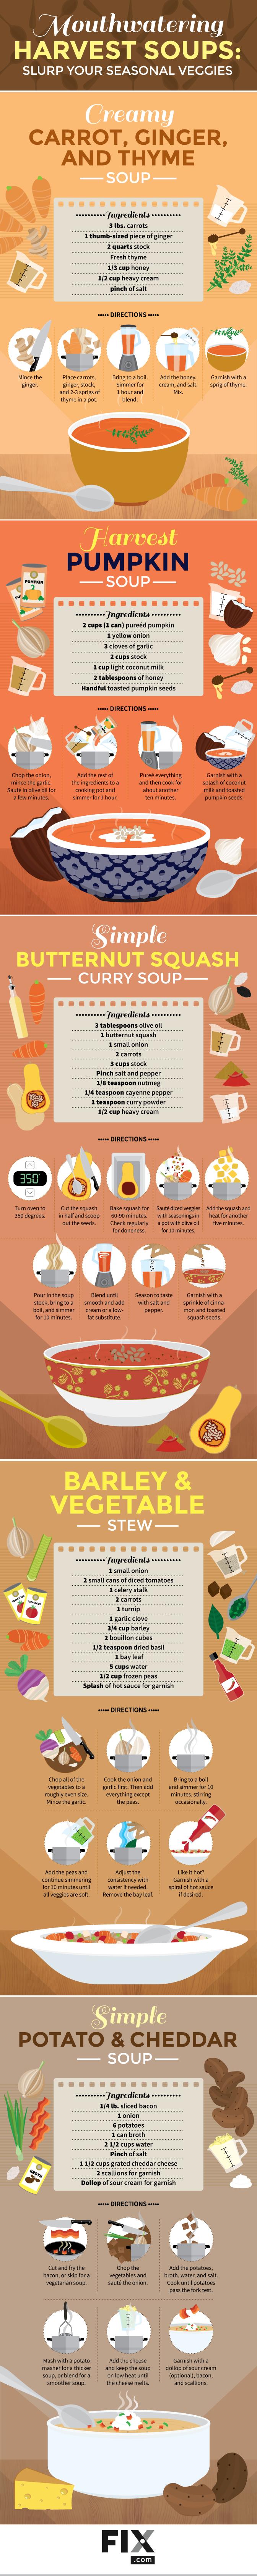 Harvest Soups: Slurp Your Seasonal Veggies